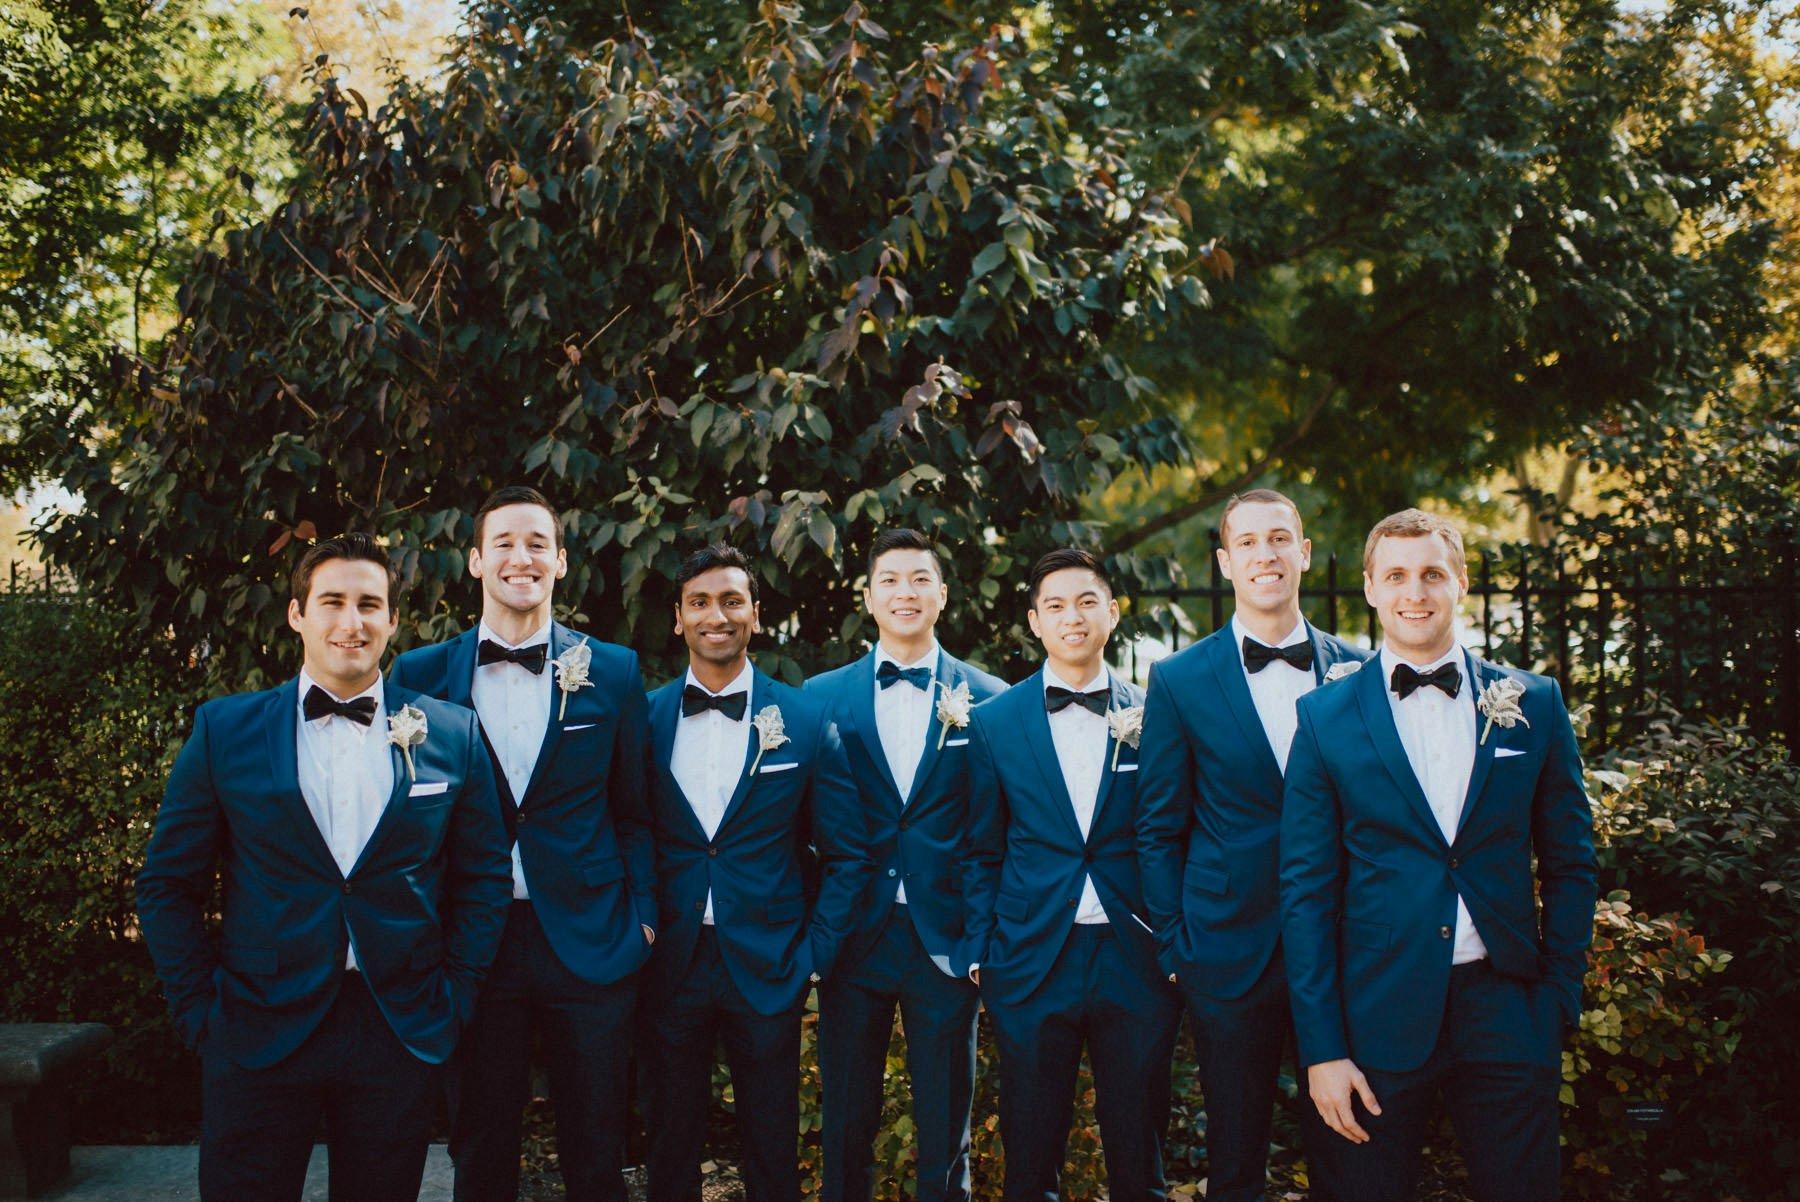 philadelphia-wedding-photographer-52.jpg